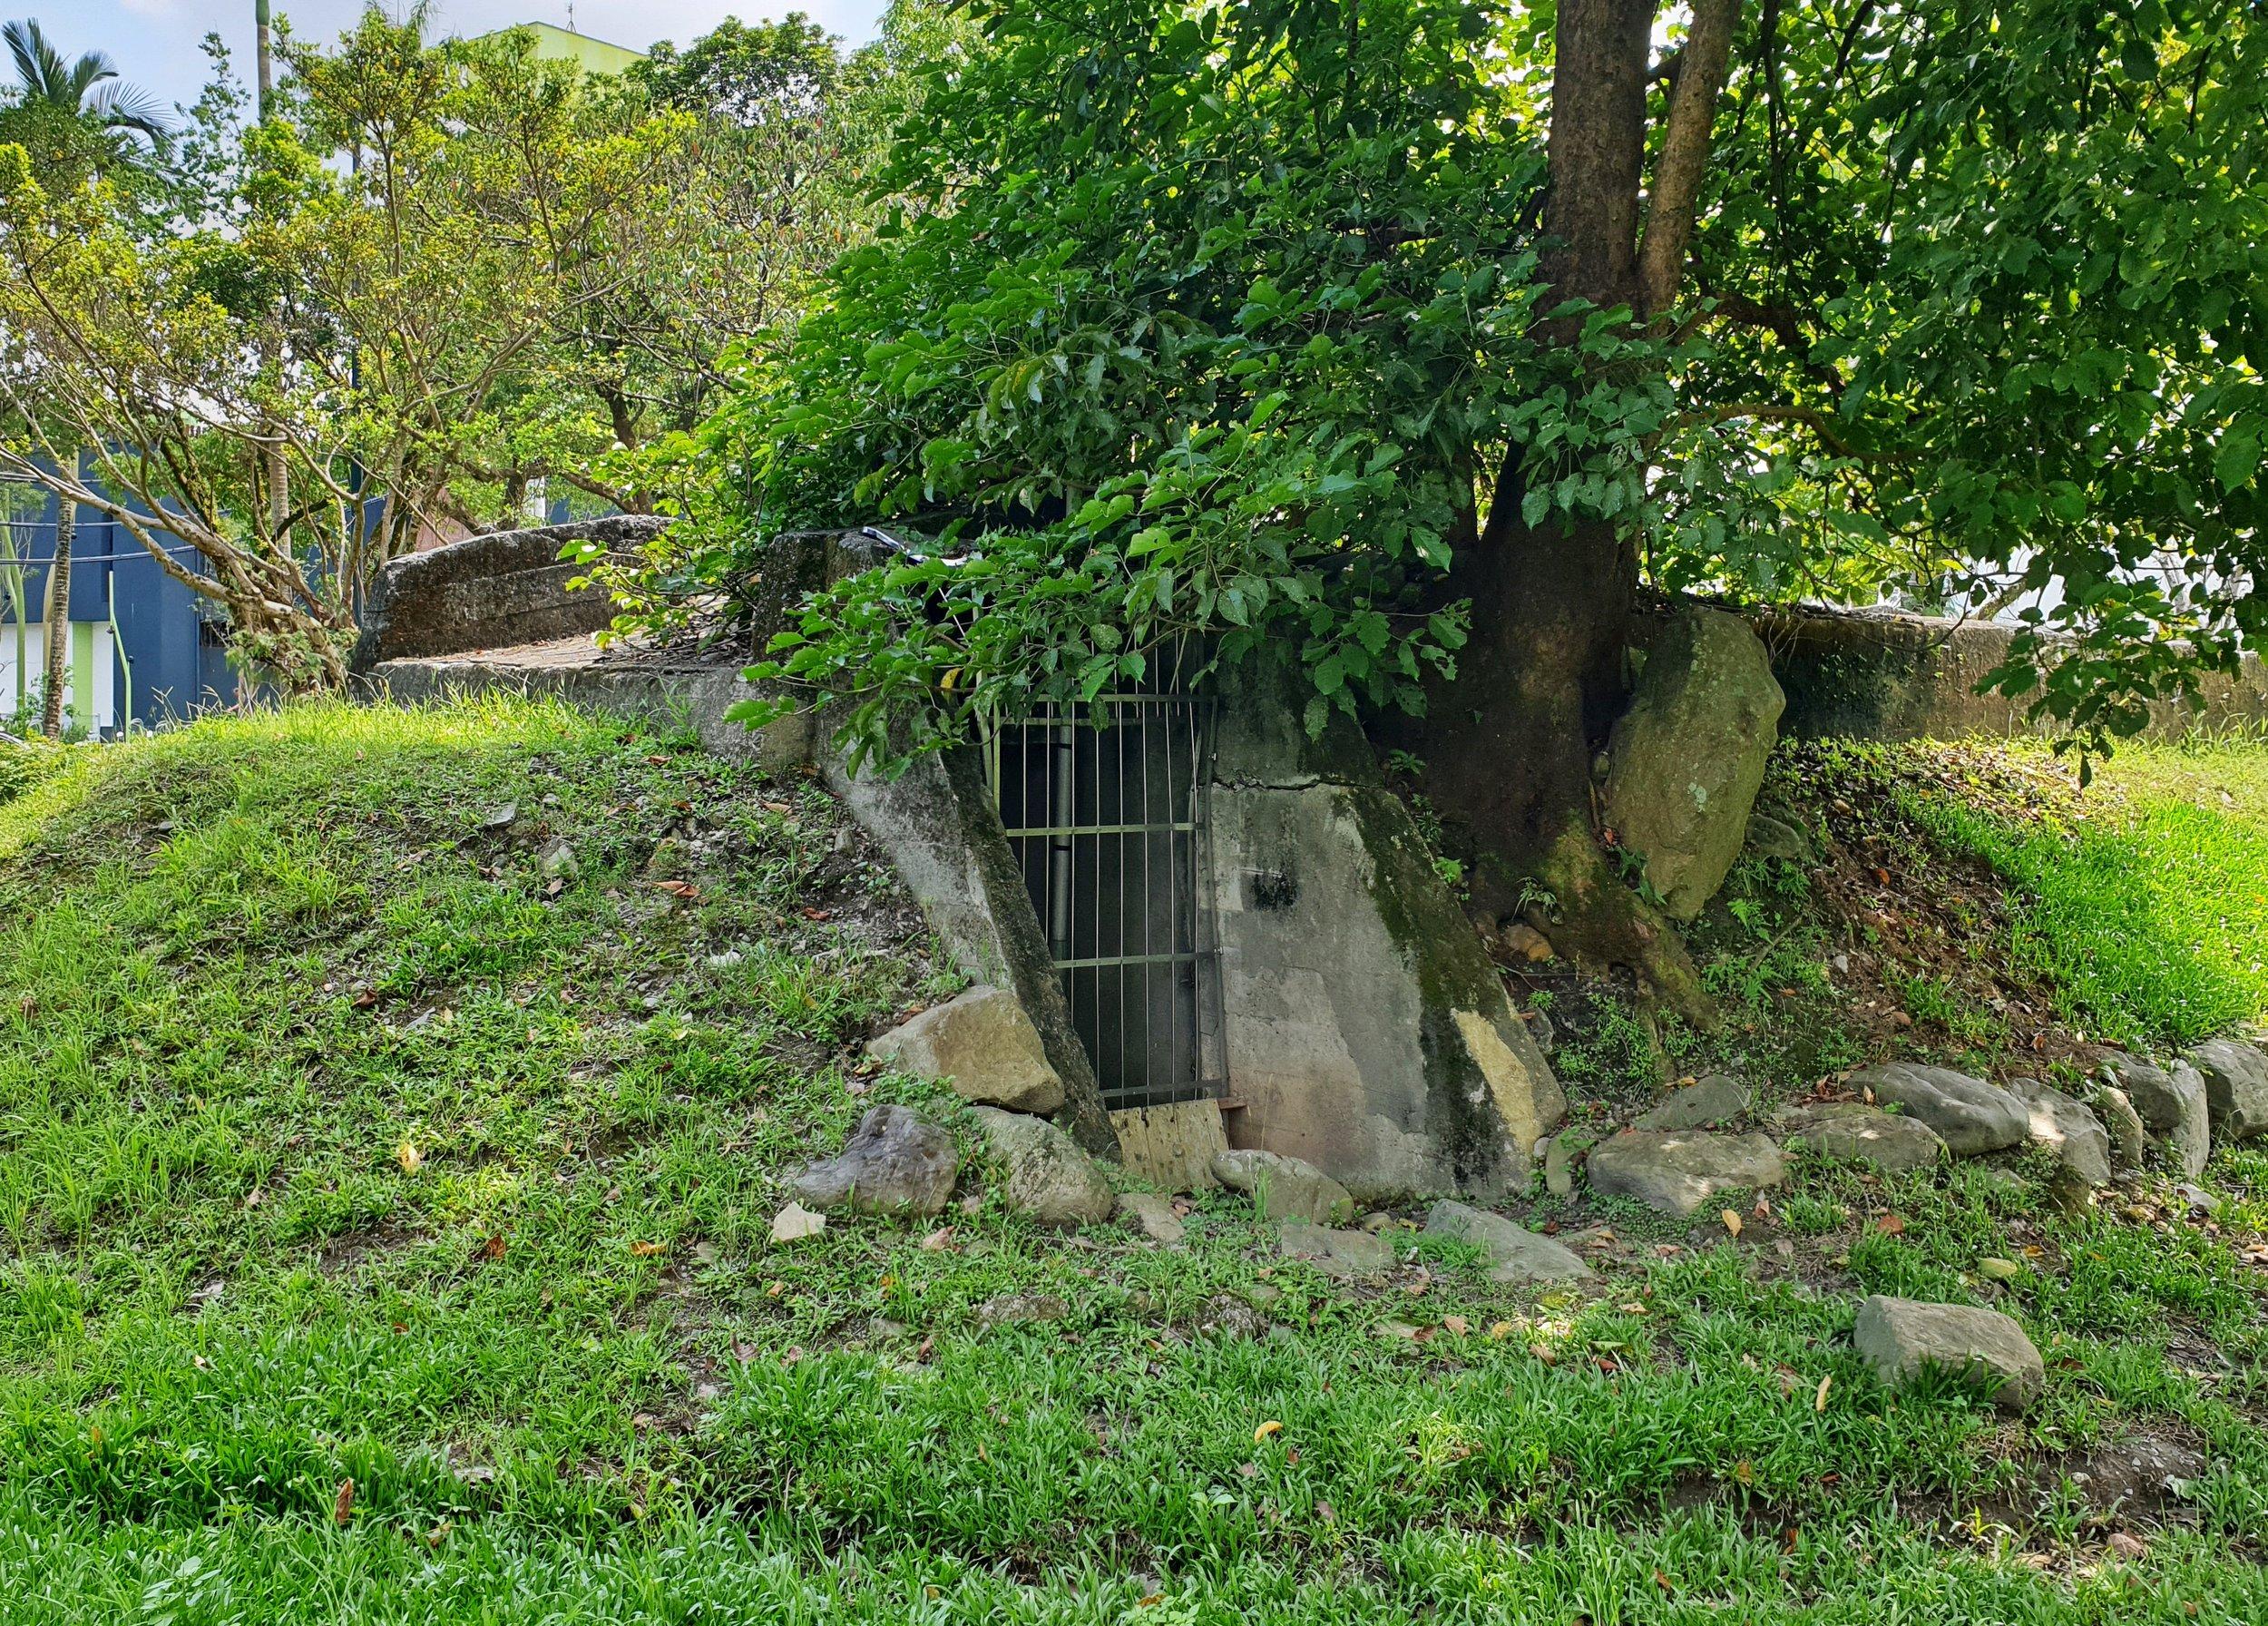 The bunker/air raid shelter